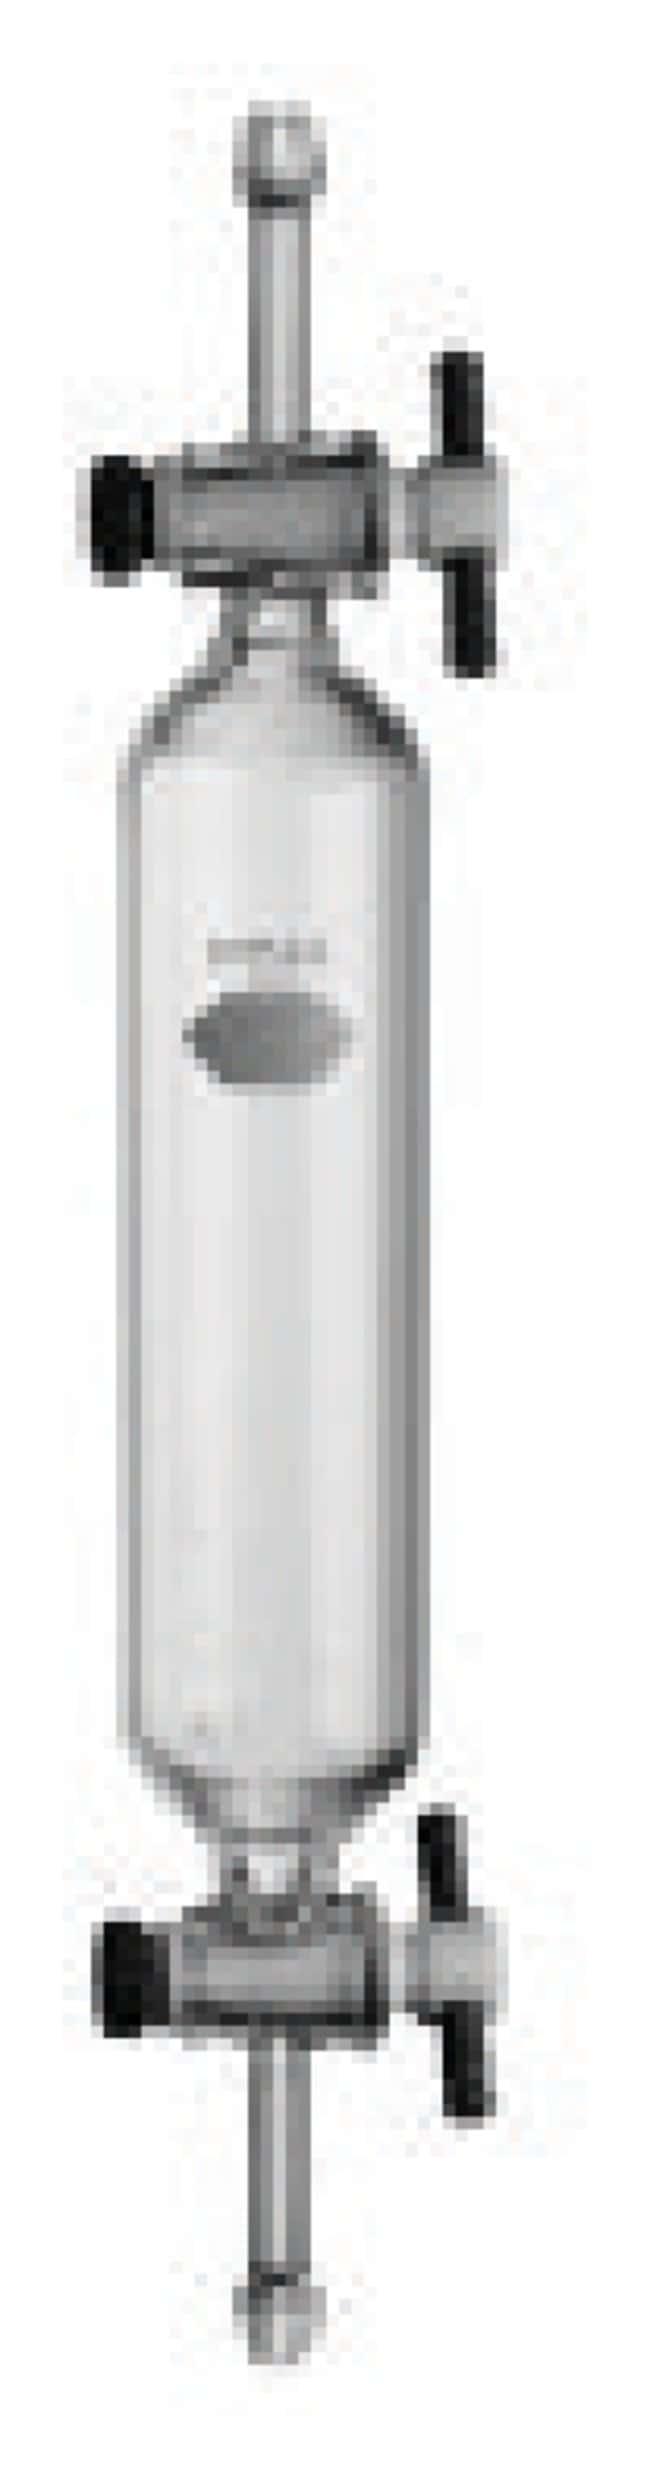 DWK Life SciencesKimble Kontes Gas Sampling Tube with PTFE Lubriflo Stopcocks